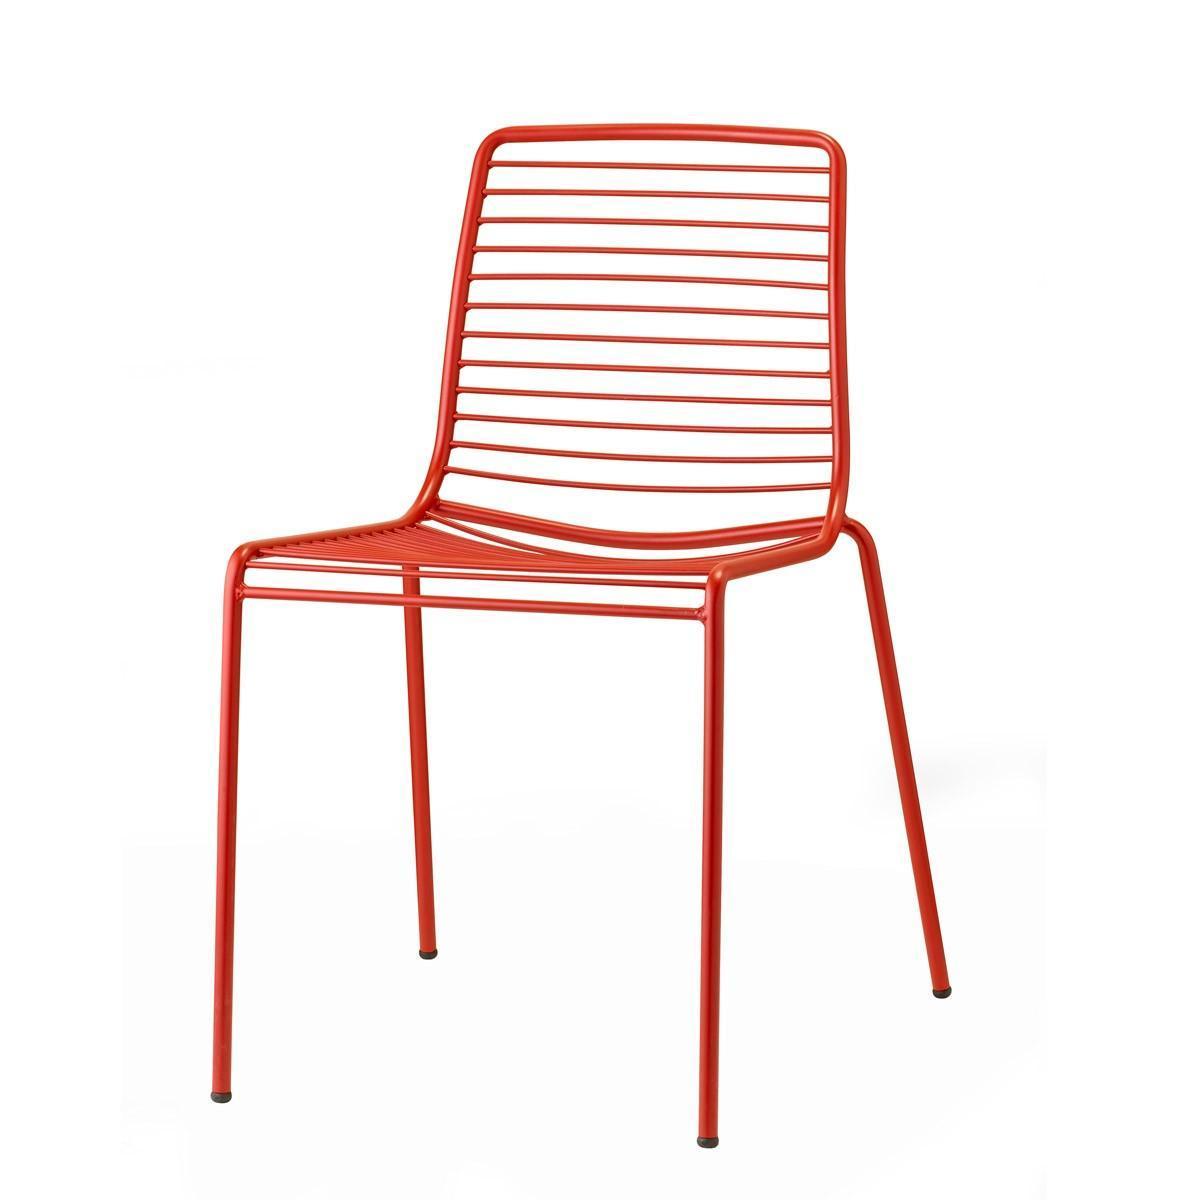 Стул металлический Summer chair